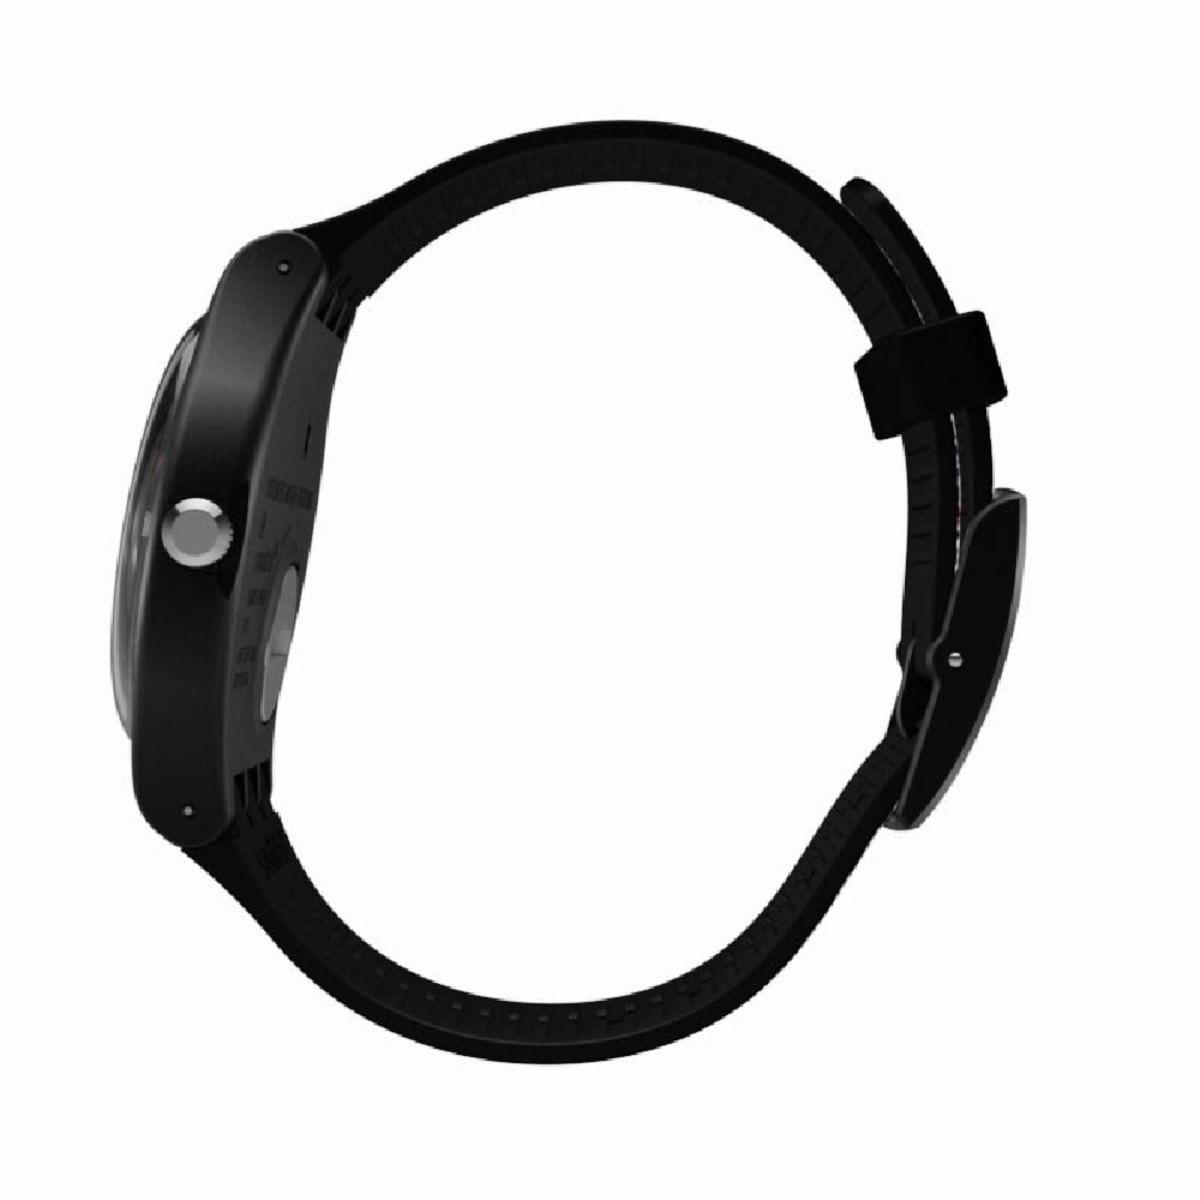 Relógio Swatch Unissex Preto - Warmth - SUOB725